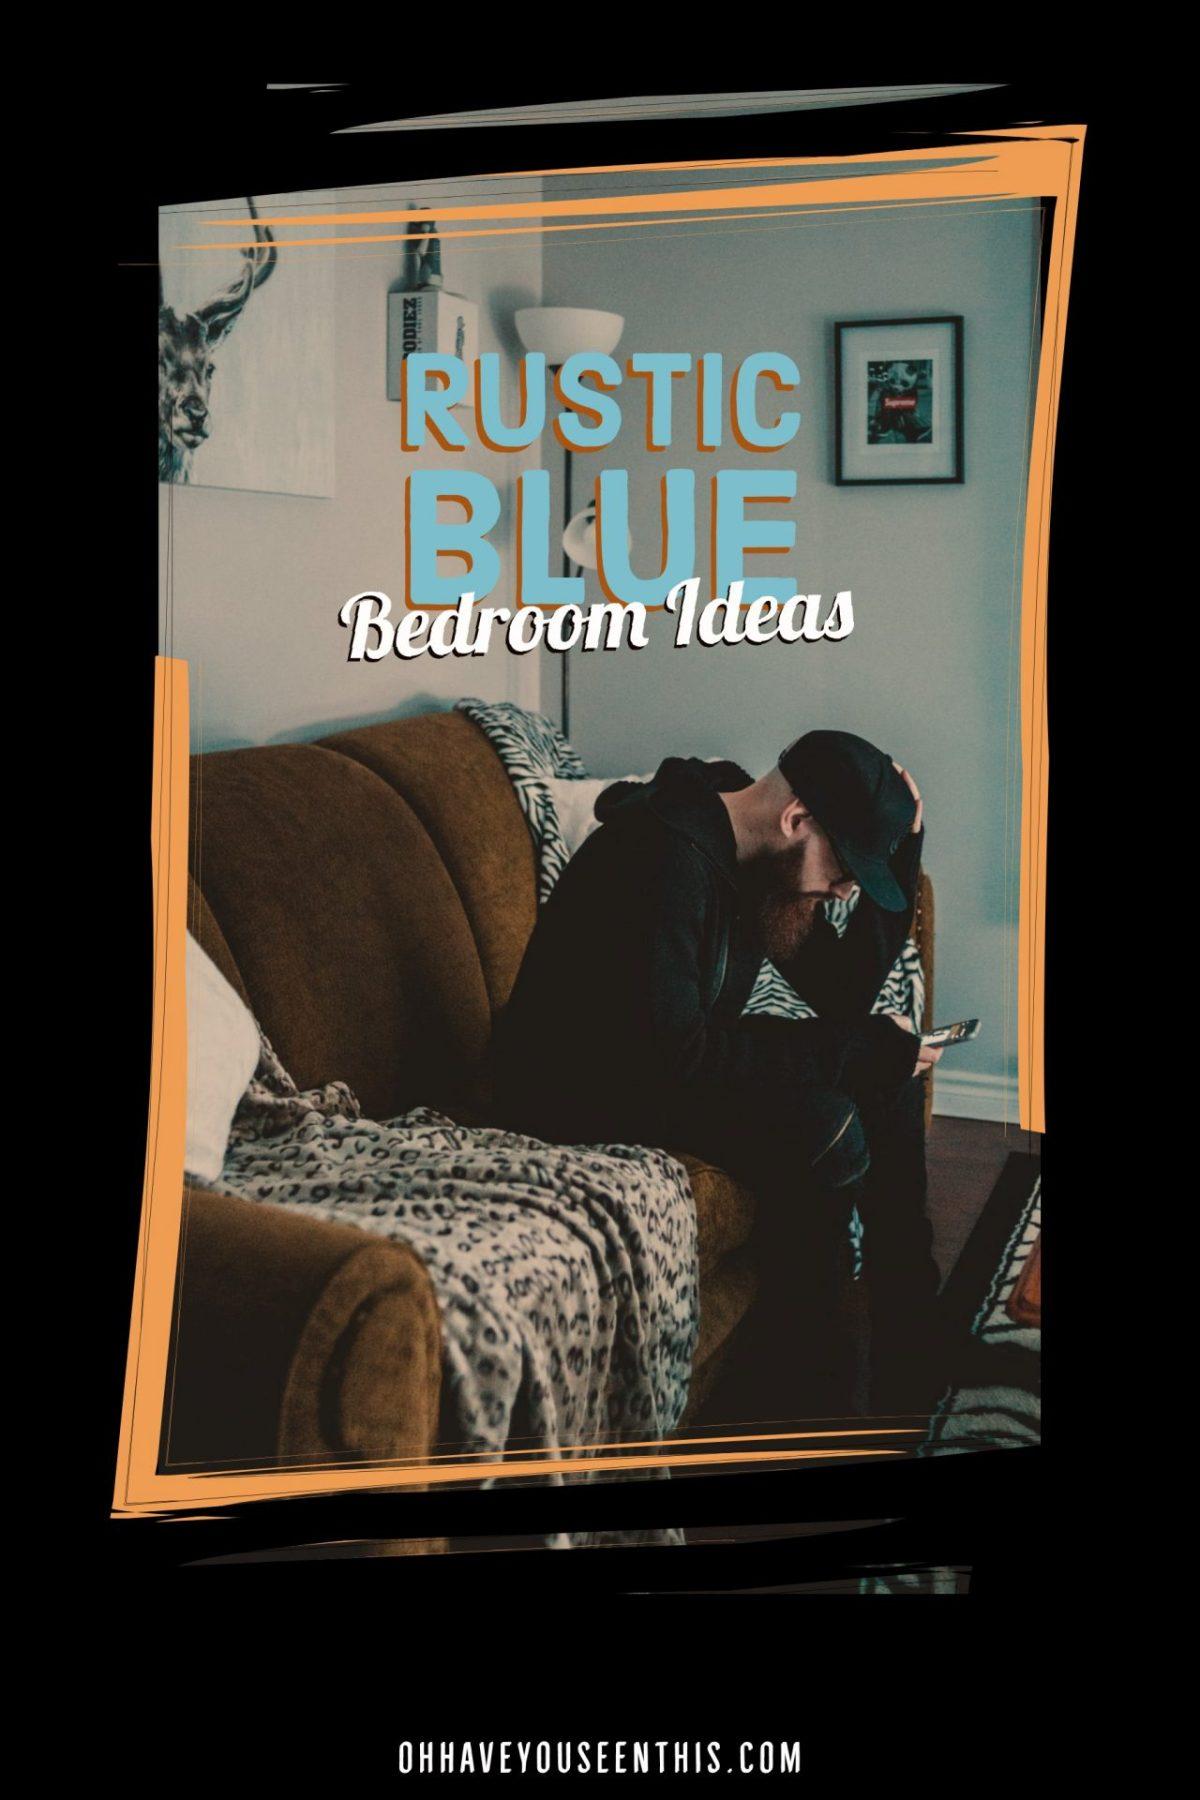 Rustic blue bedroom ideas